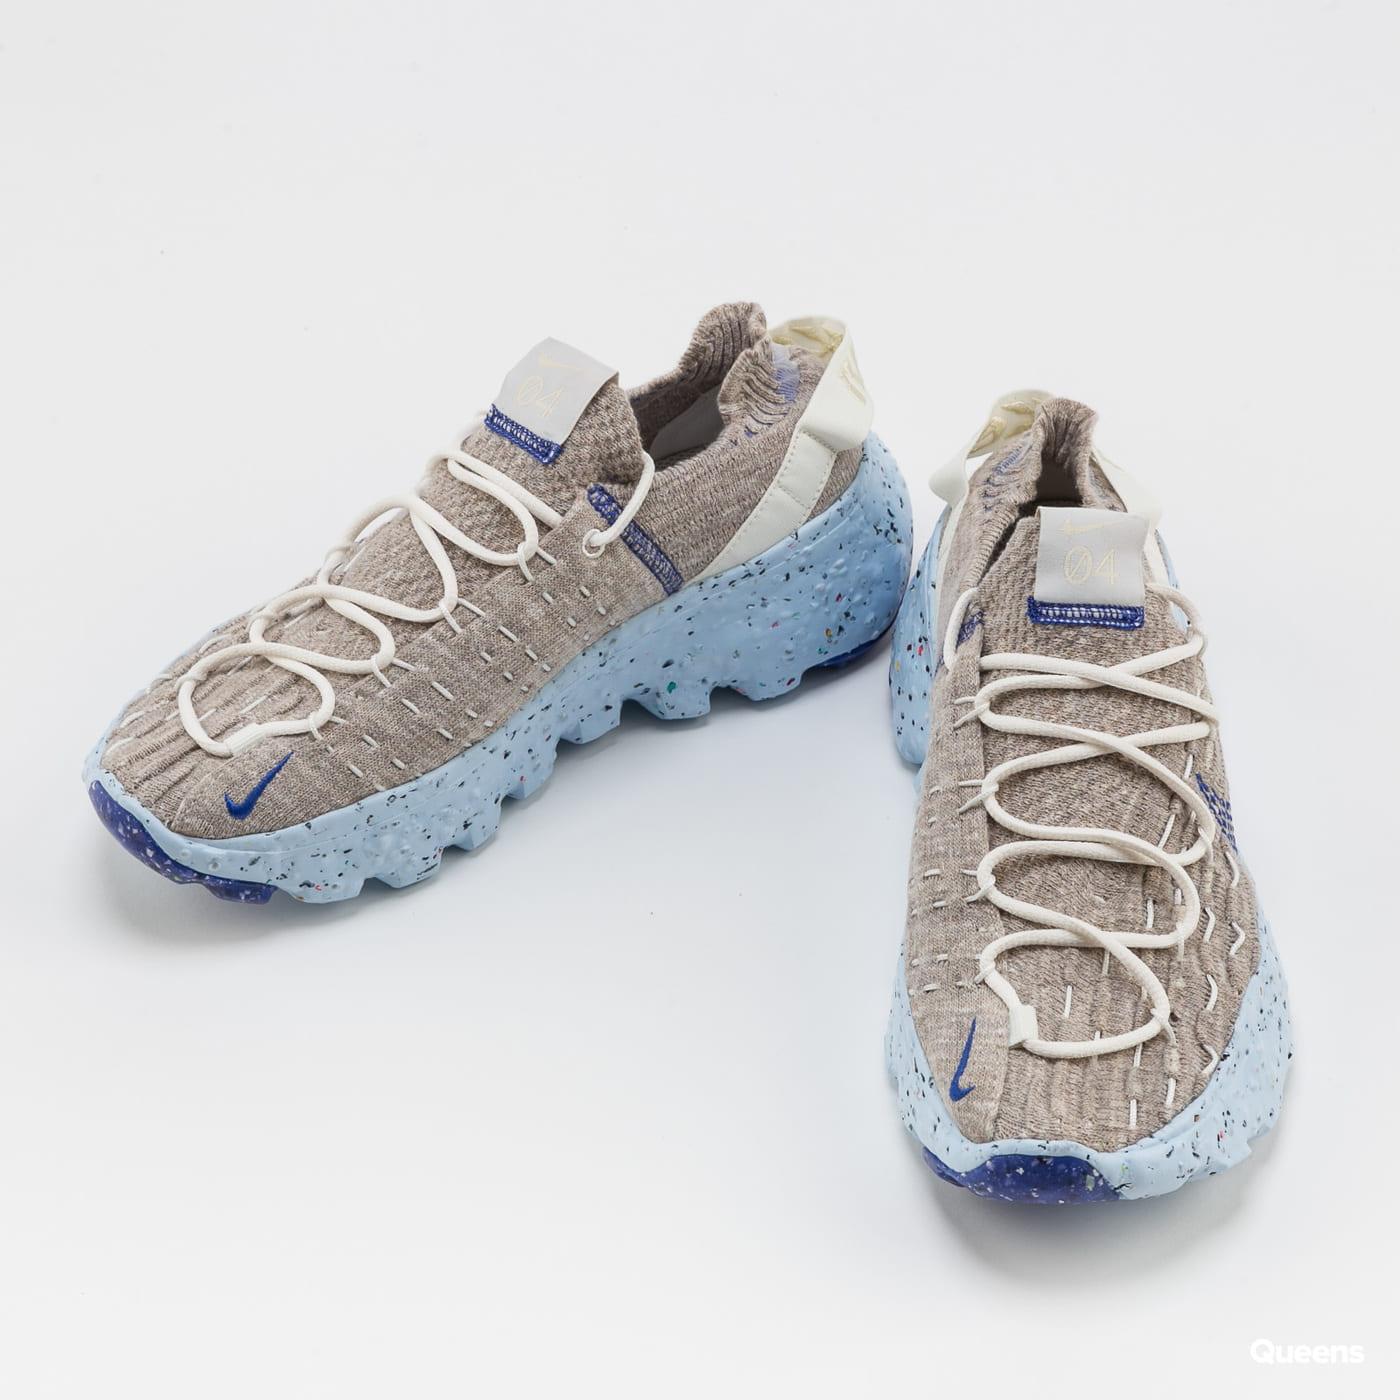 Nike W Space Hippie 04 sail / astronomy blue - fossil